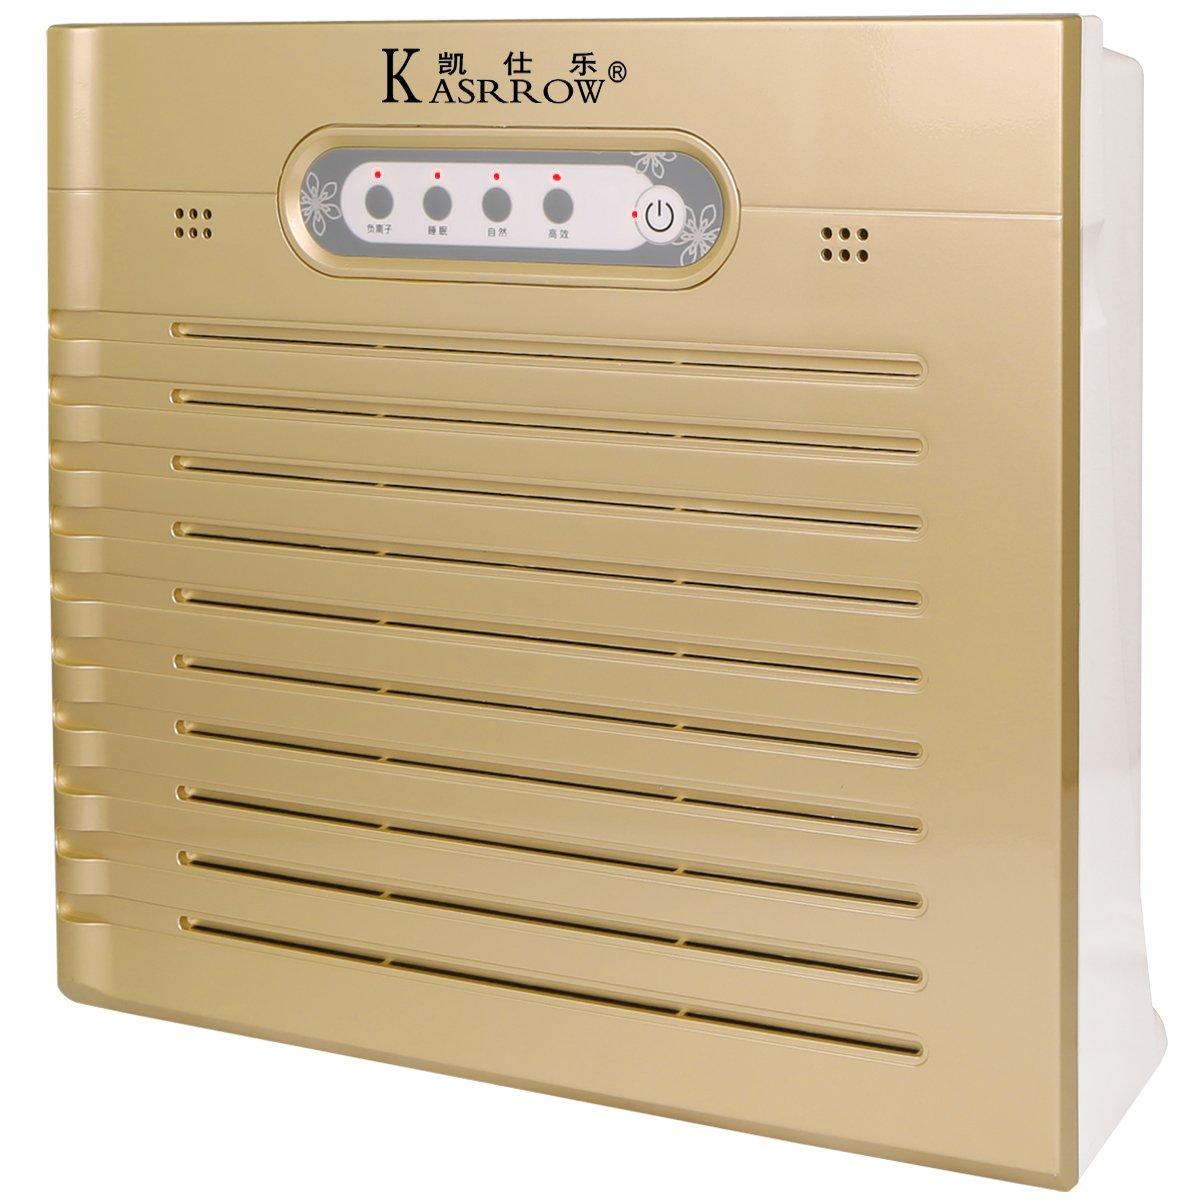 Kasrrow 凯仕乐 KSR-AP23 空气净化器 金色